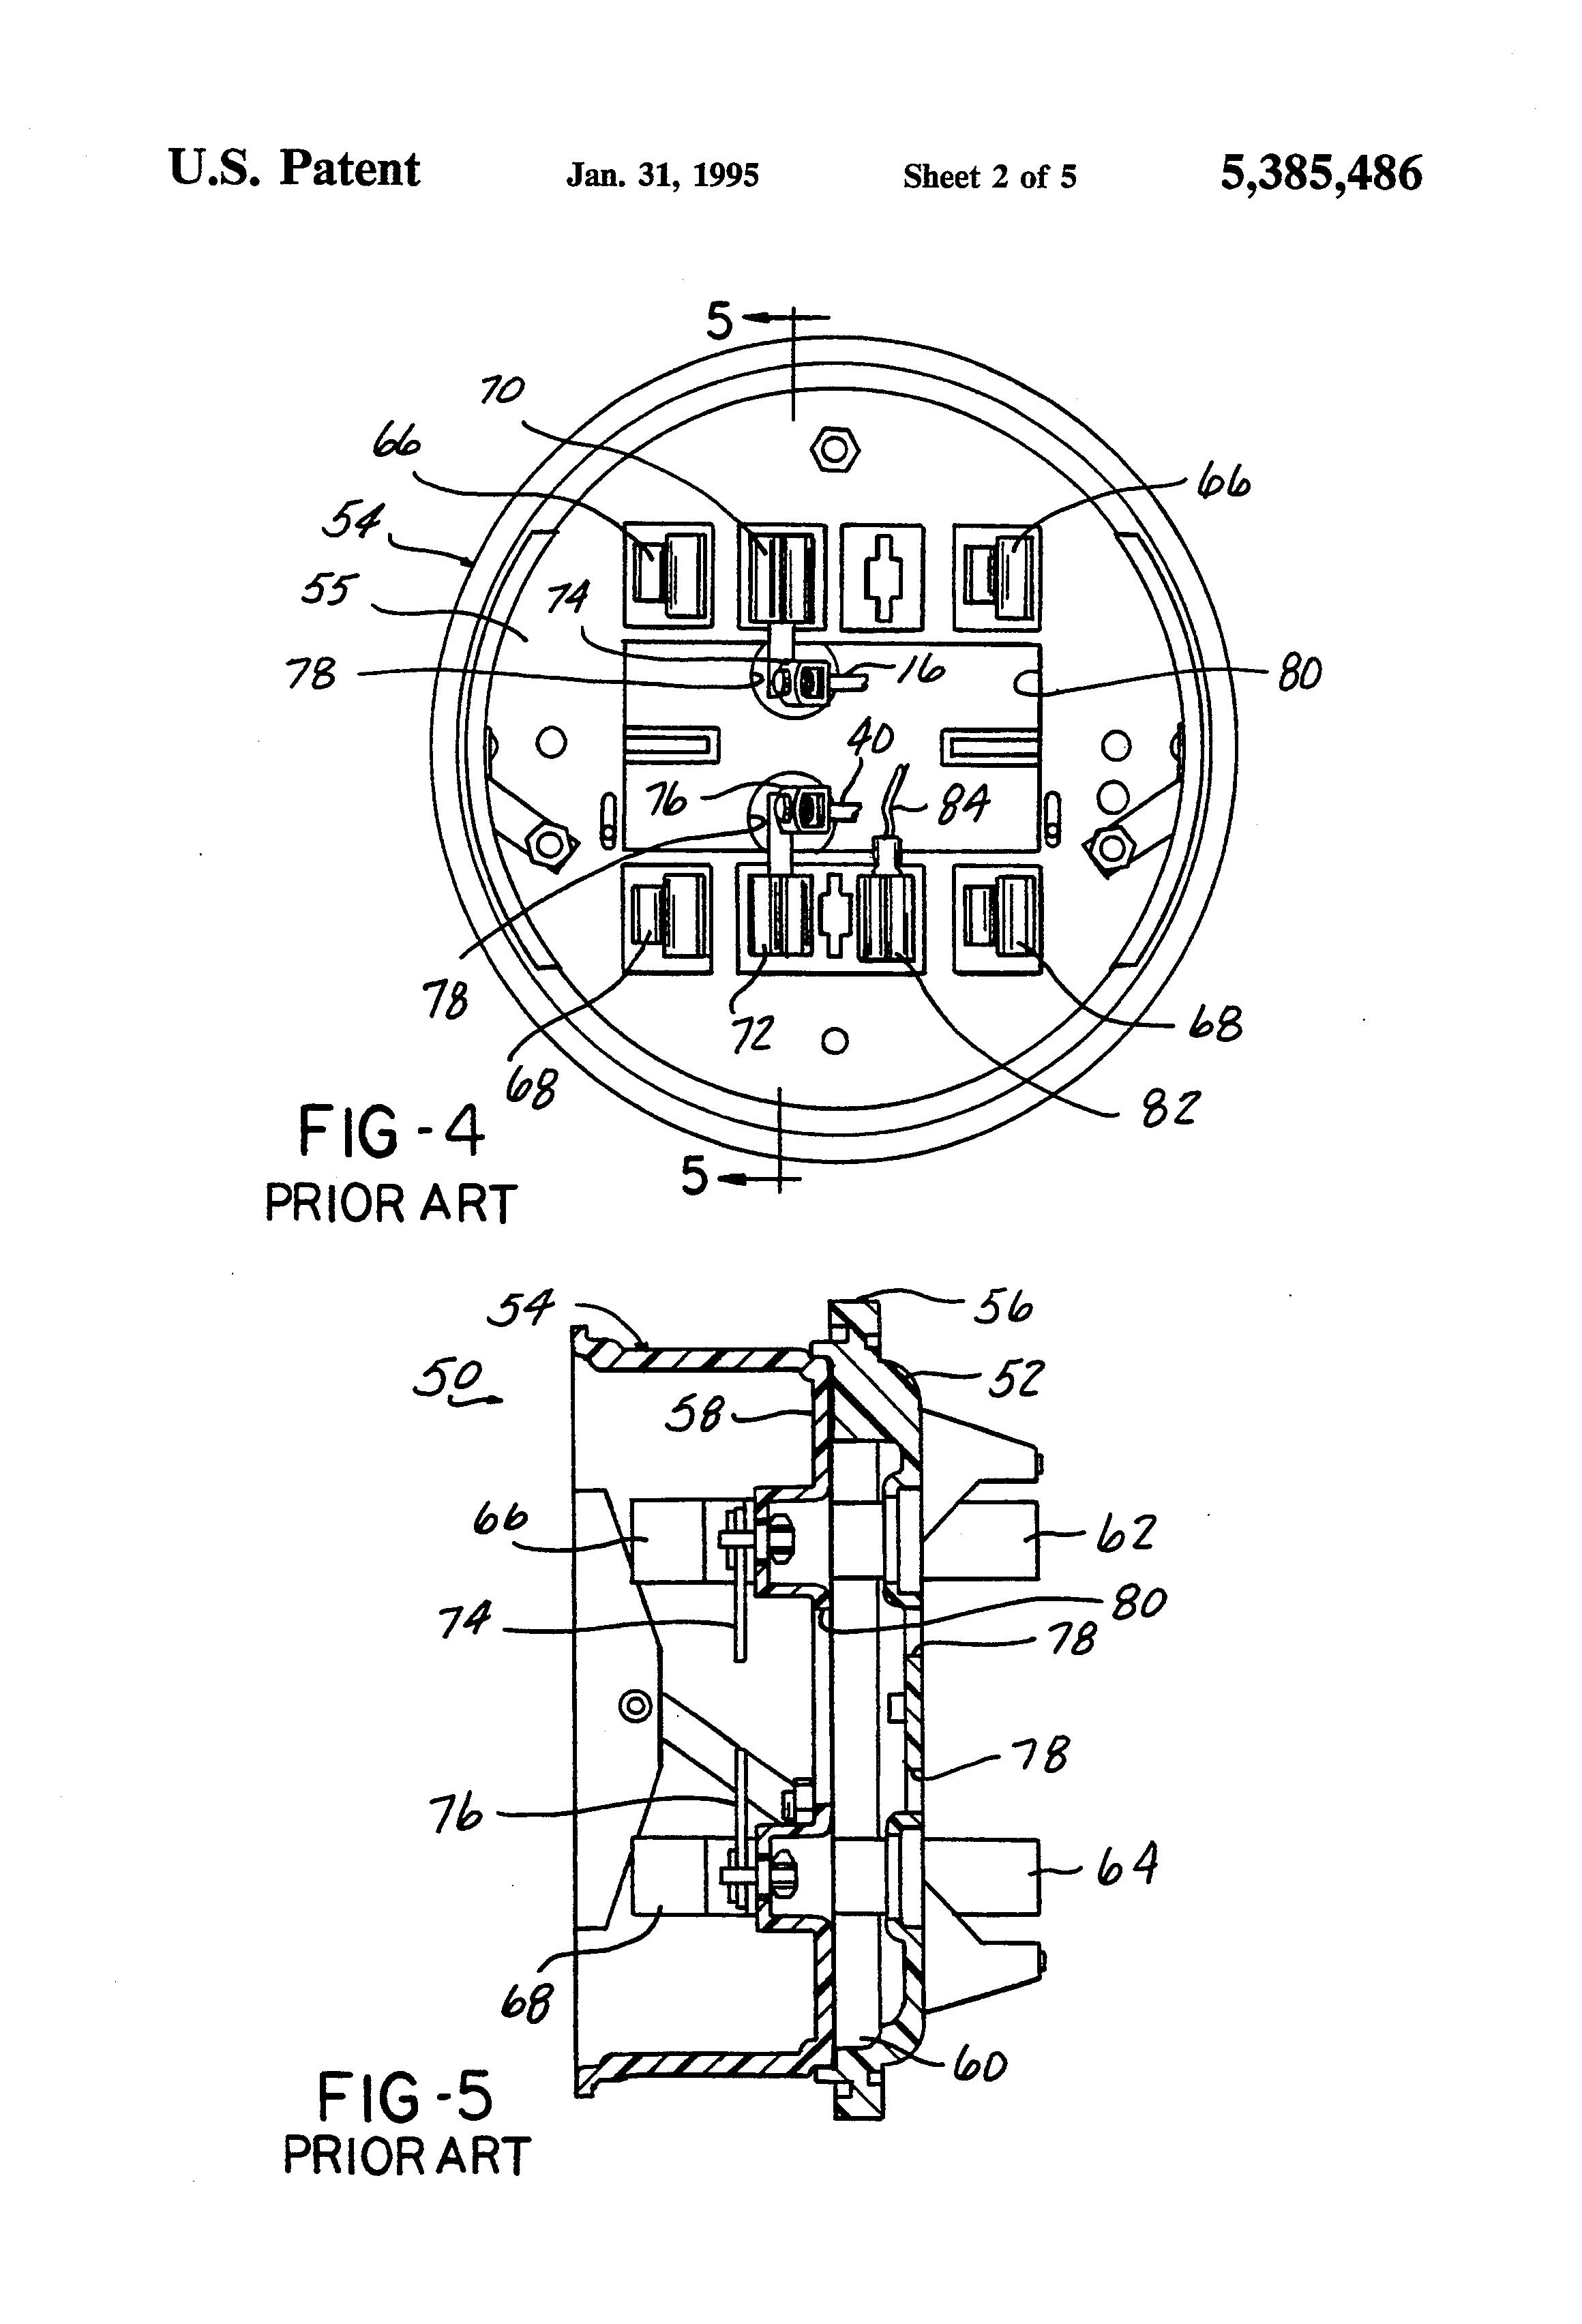 5 Jaw Meter Socket Wiring Diagram Wiring Diagram And Hernes – Meter Base Wiring Diagram